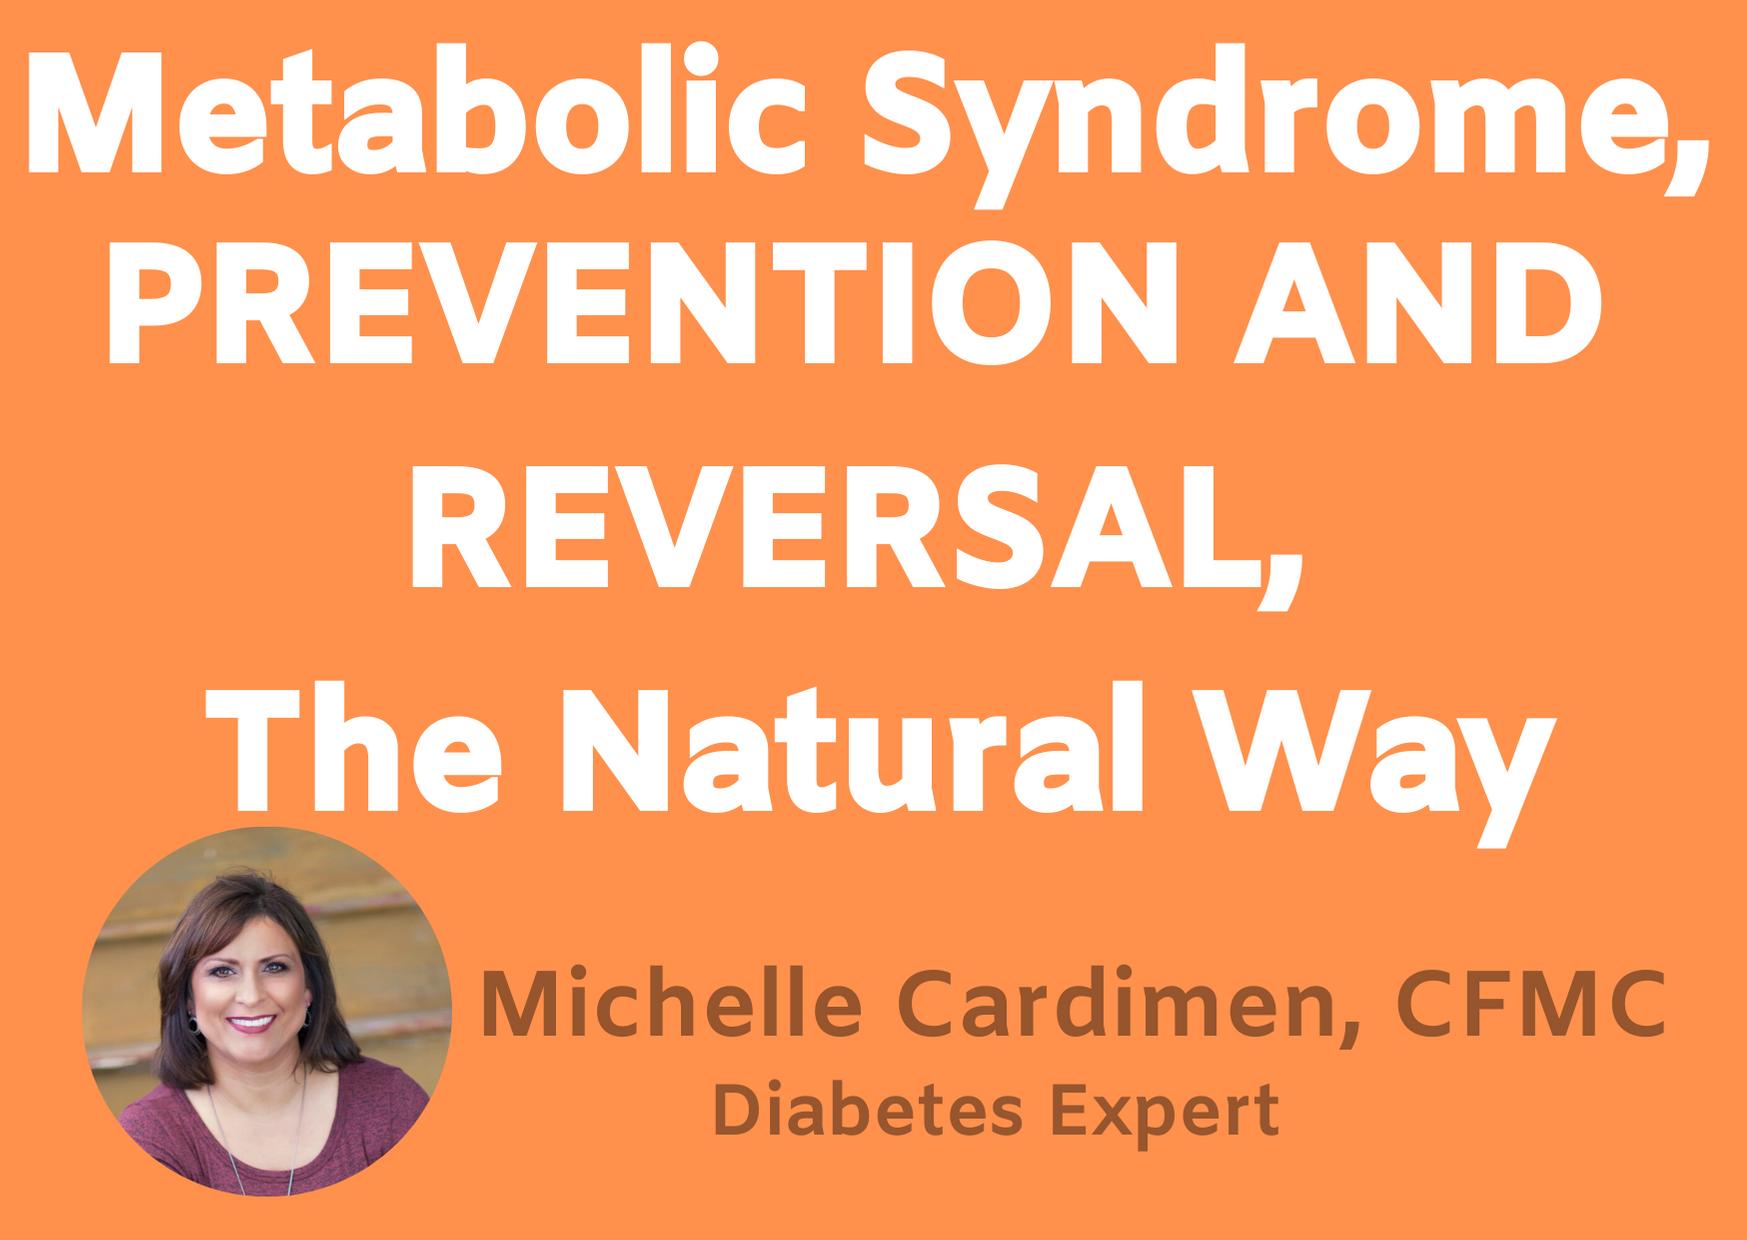 Michelle Cardimen's Metabolic Syndrome